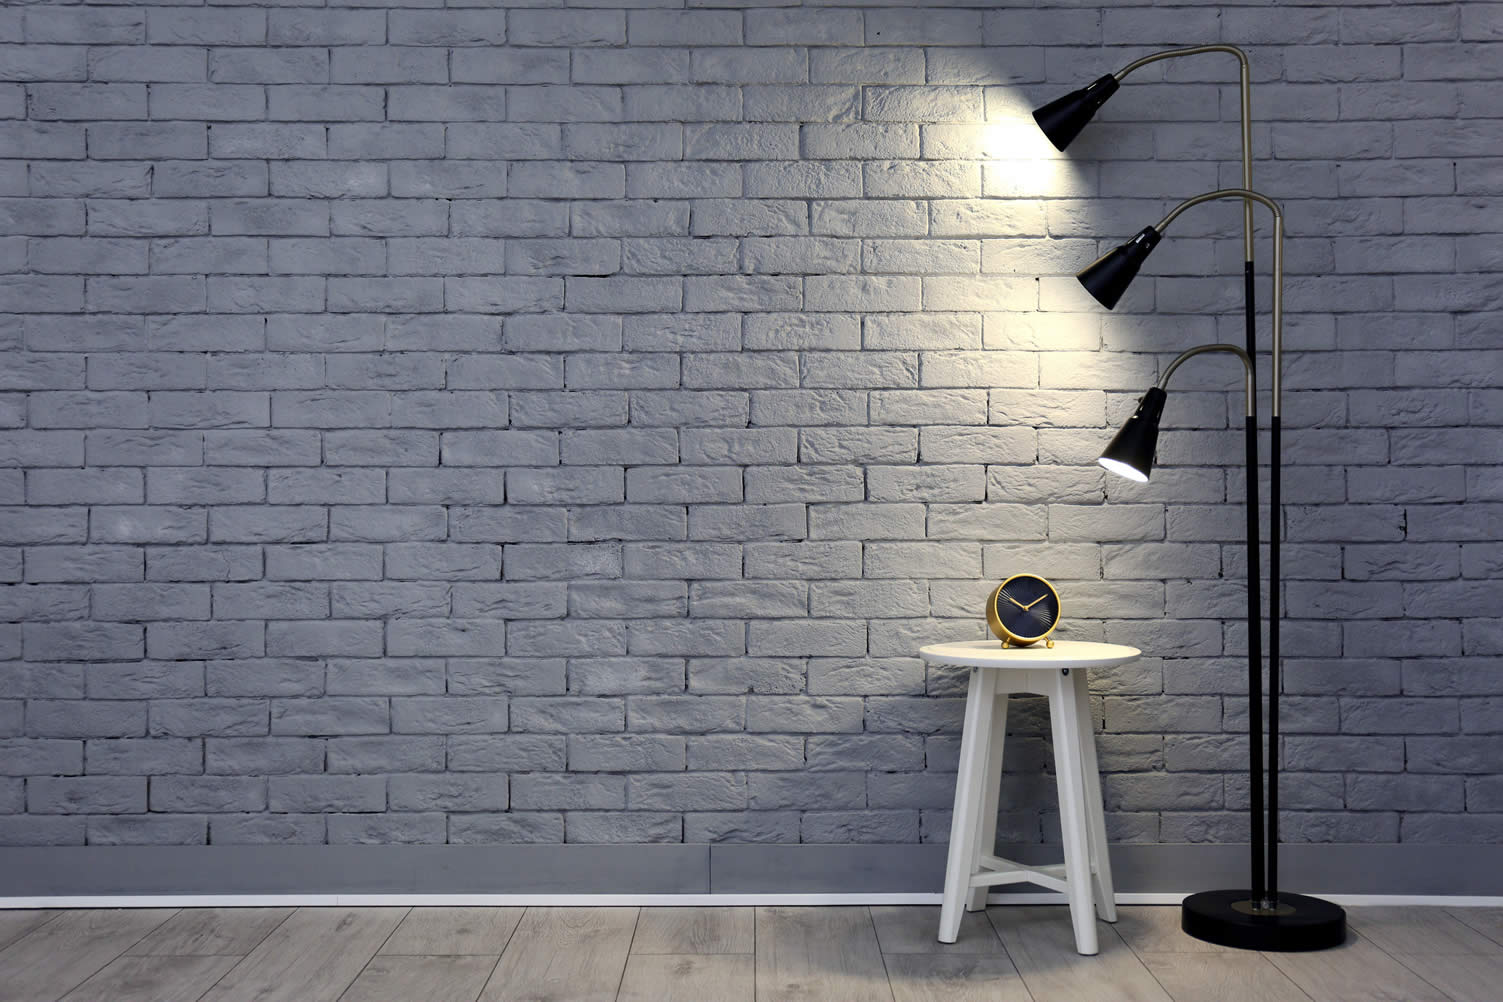 using arc lamps